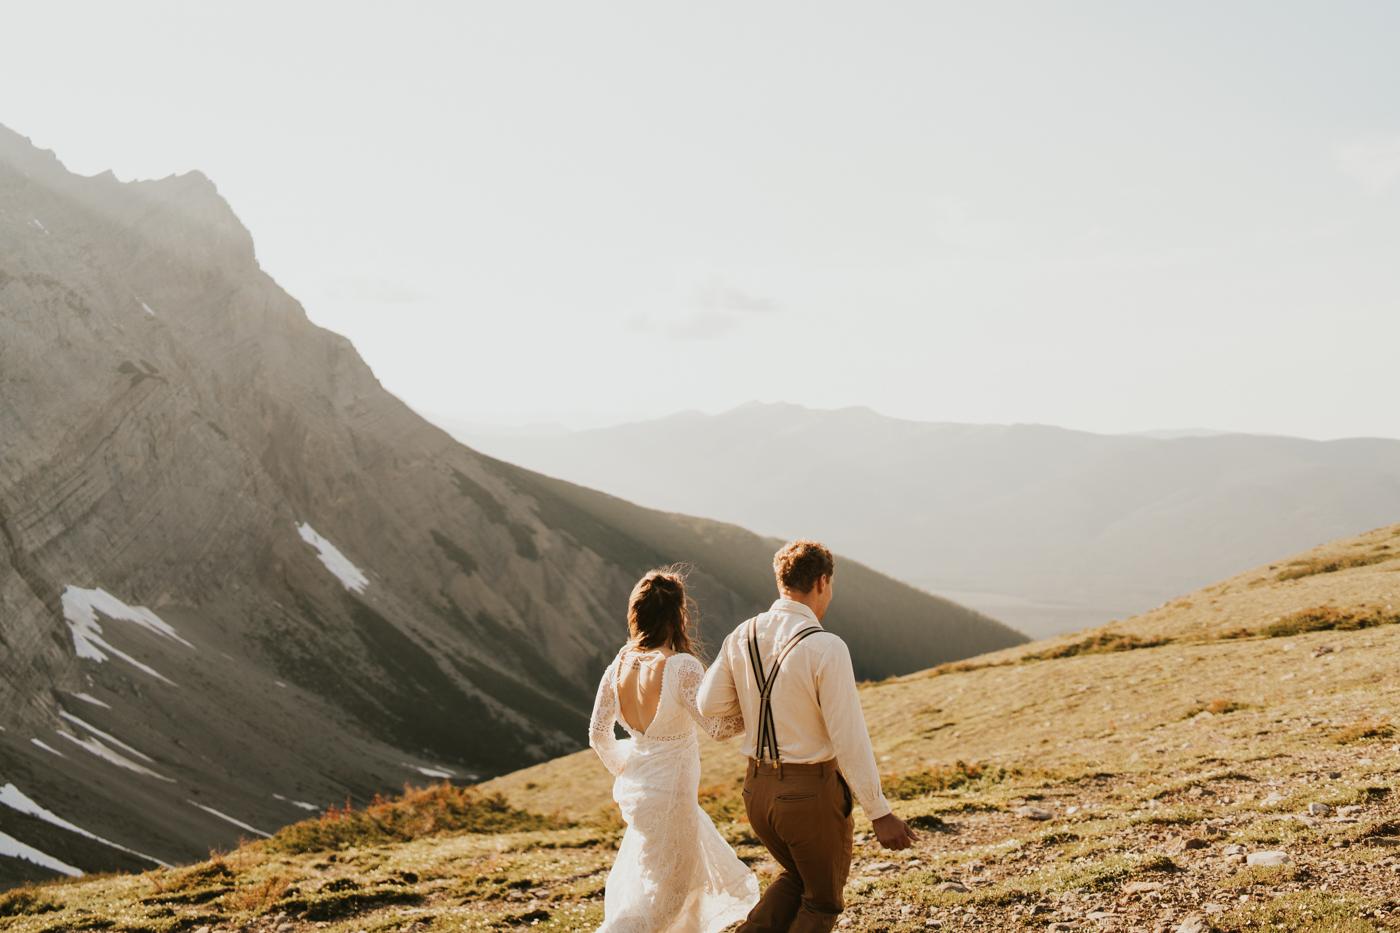 tyraephotography_photographer_wedding_elopement_engagement_photography-08422.jpg